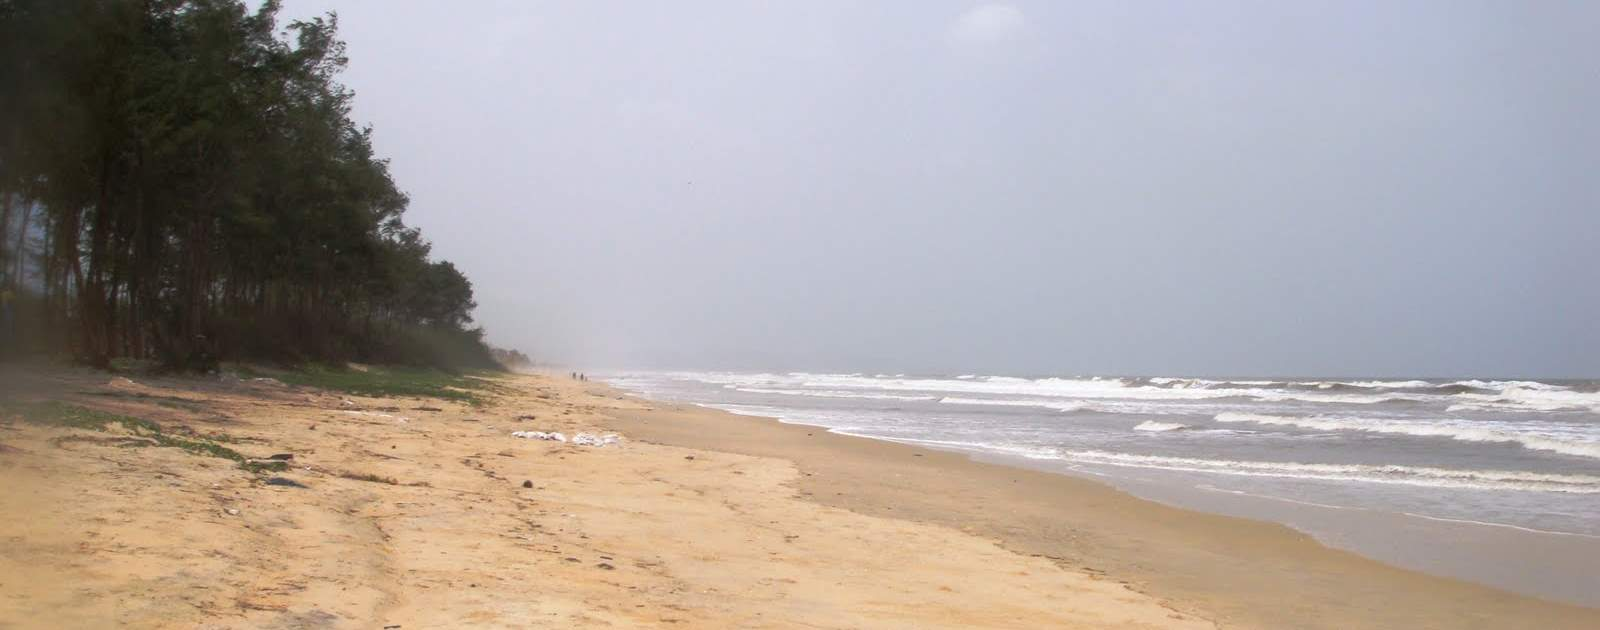 Varca, Cavelossim, Mobor Beach